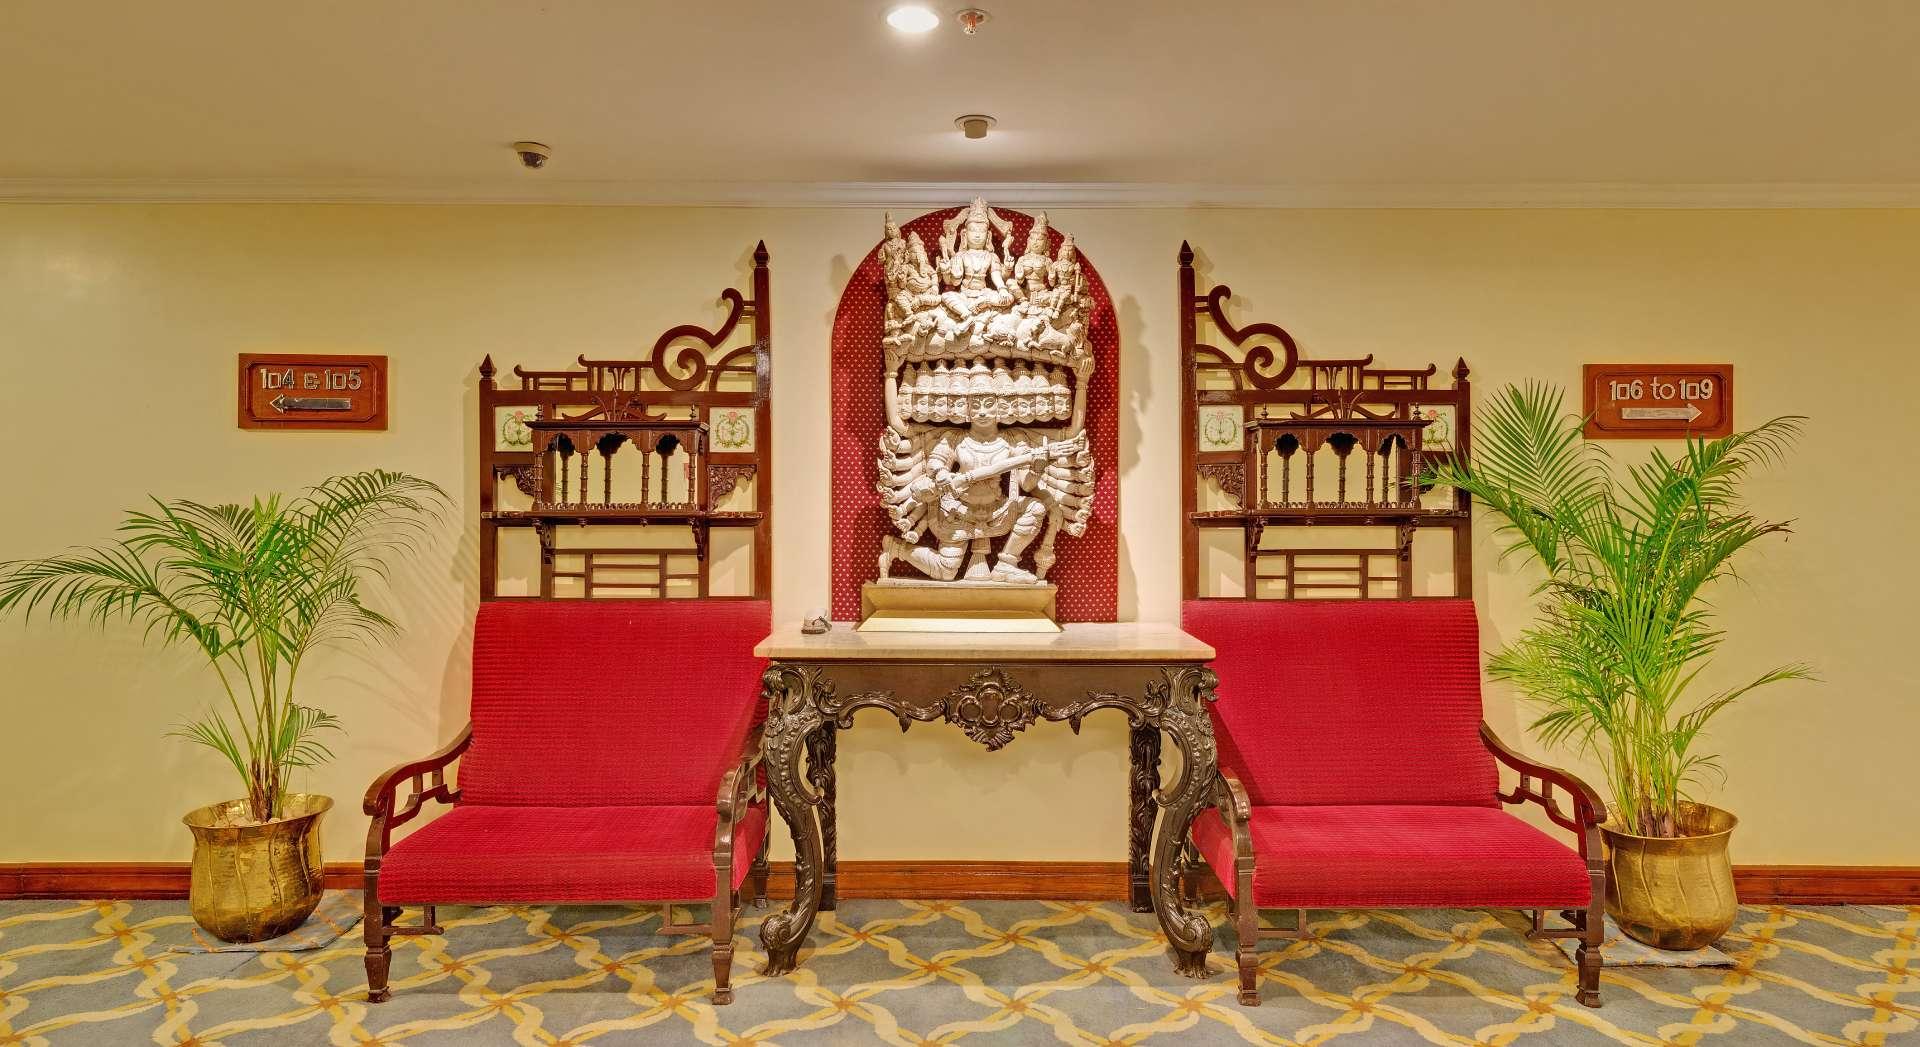 chennai Heritage Room ambassador pallava entrance - The Ambassador | Heritage Hotels in Mumbai, Aurangabad, Chennai - Terms & Conditions